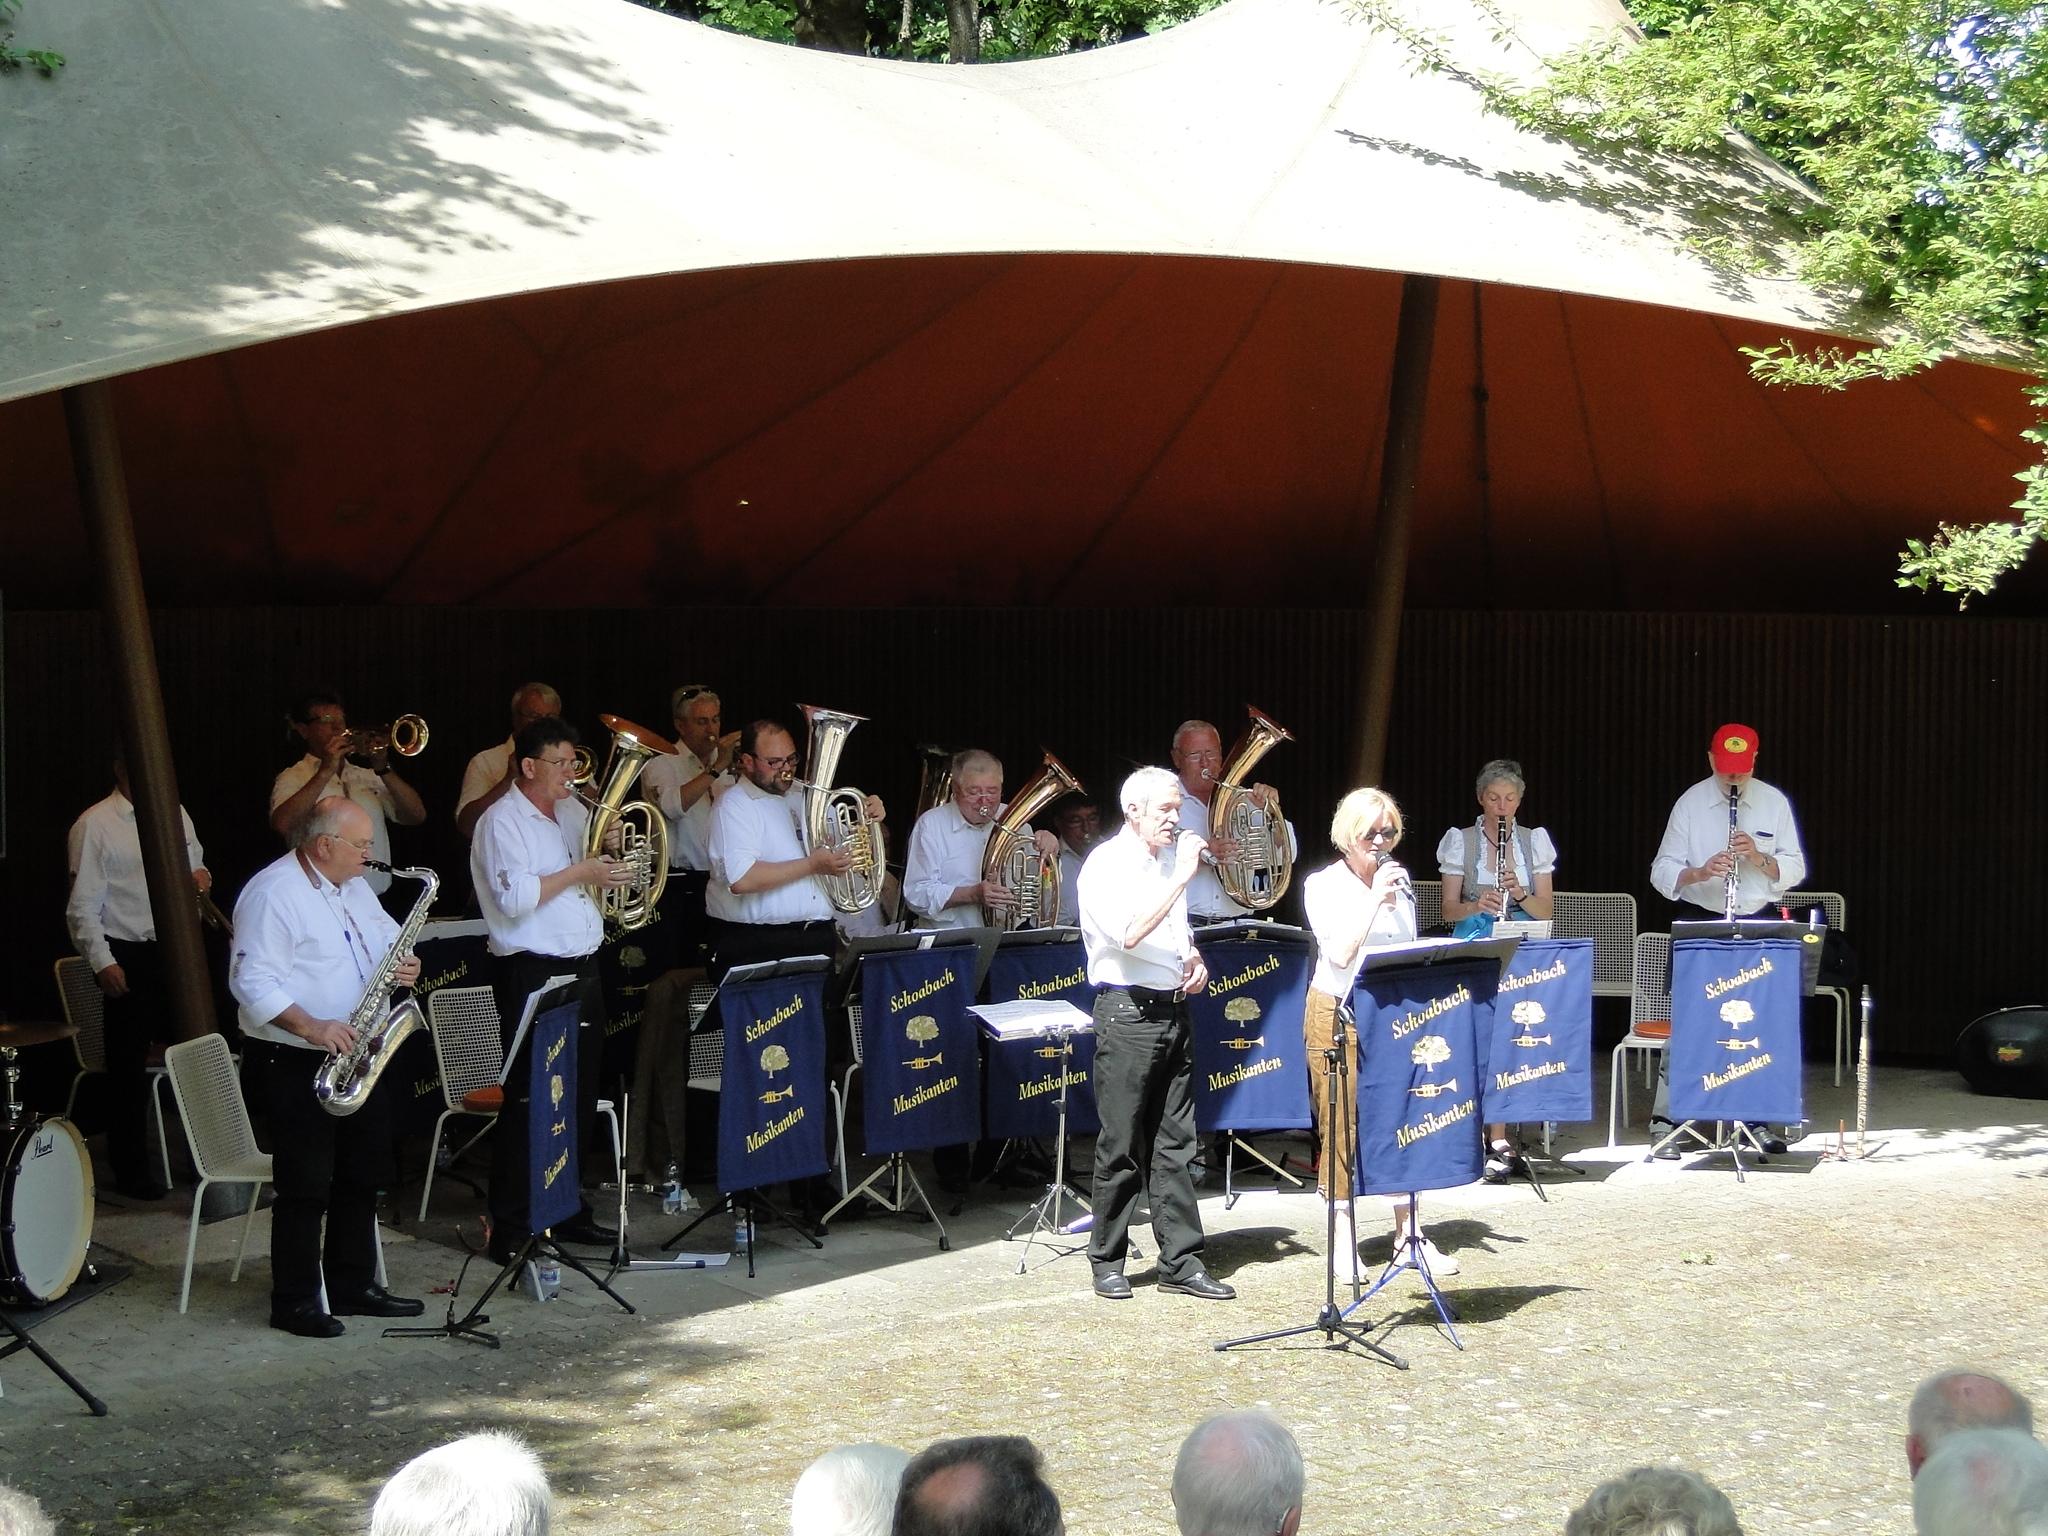 Sonntagsmatinee Kurpark Bad Urach 22.05.2016